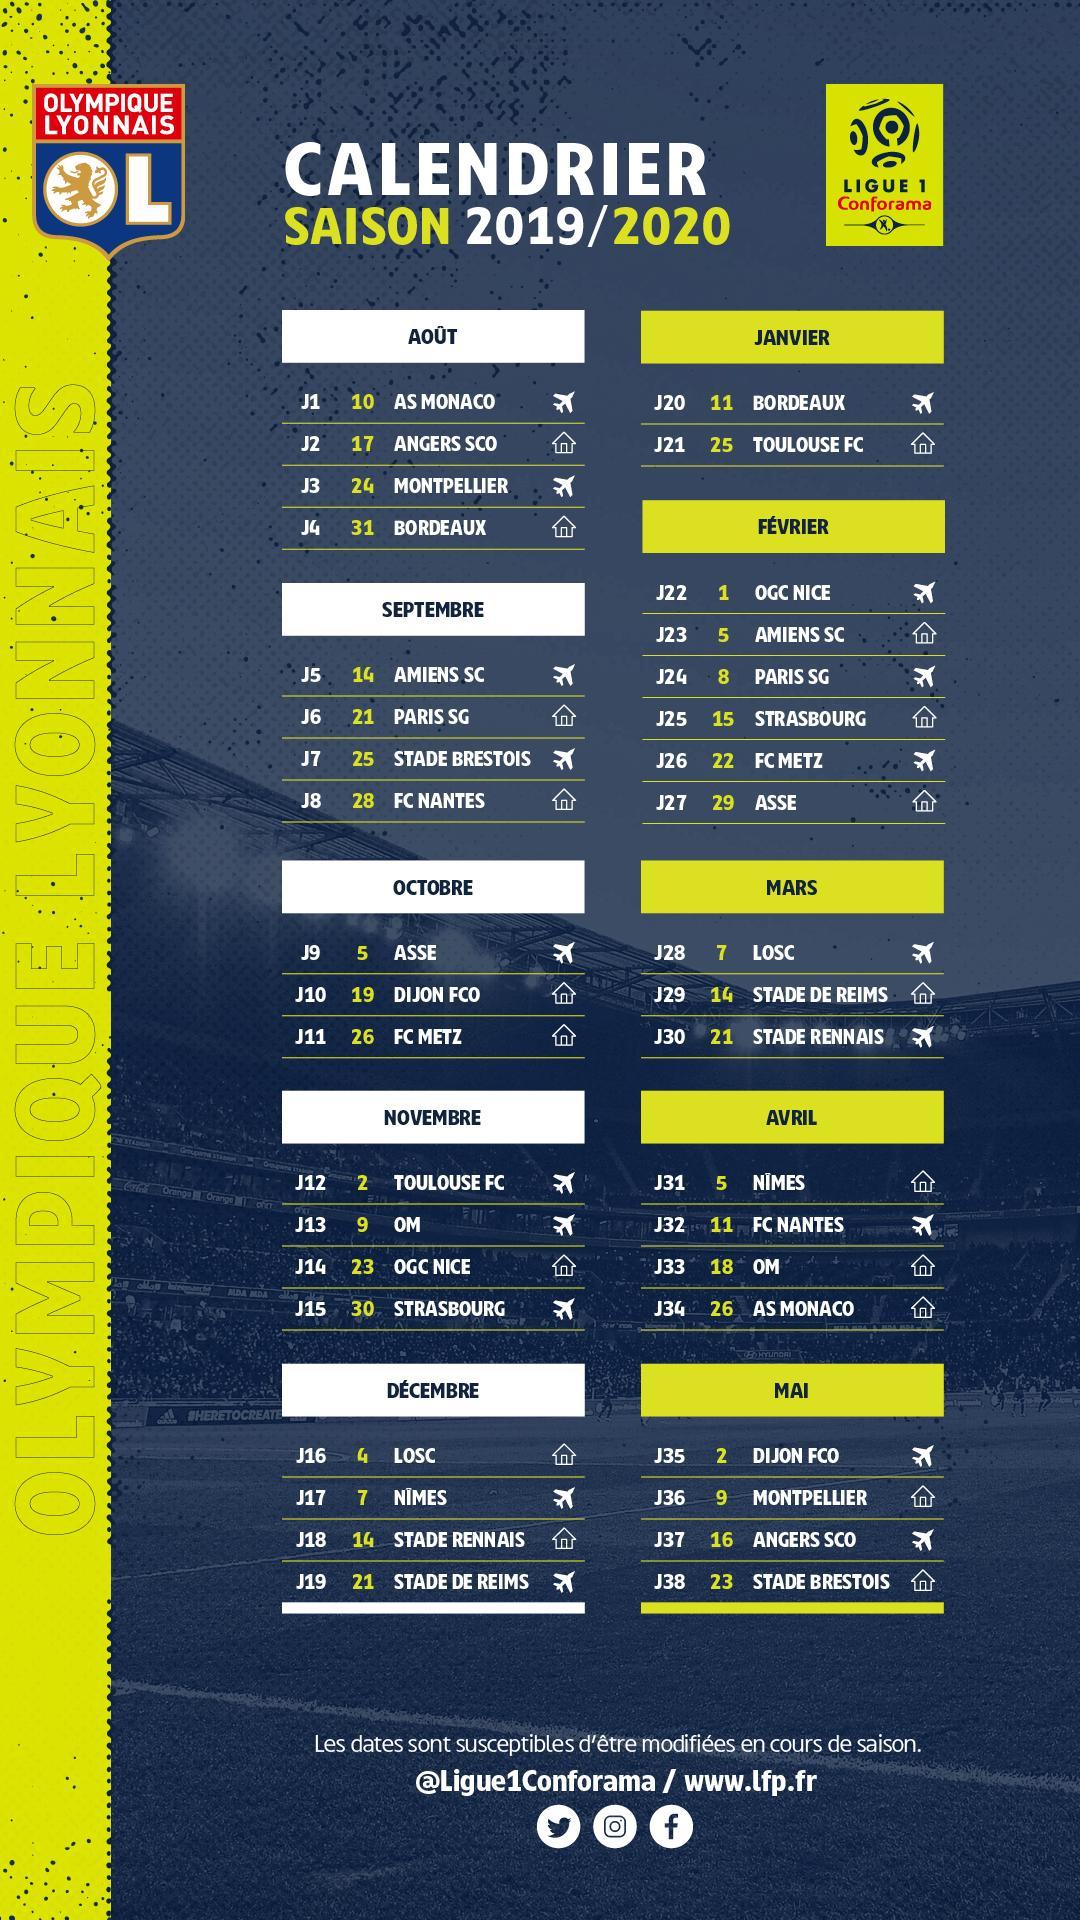 Calendrier Fifa Coupe Du Monde 2020.Le Calendrier 2019 2020 Integral De L Ol